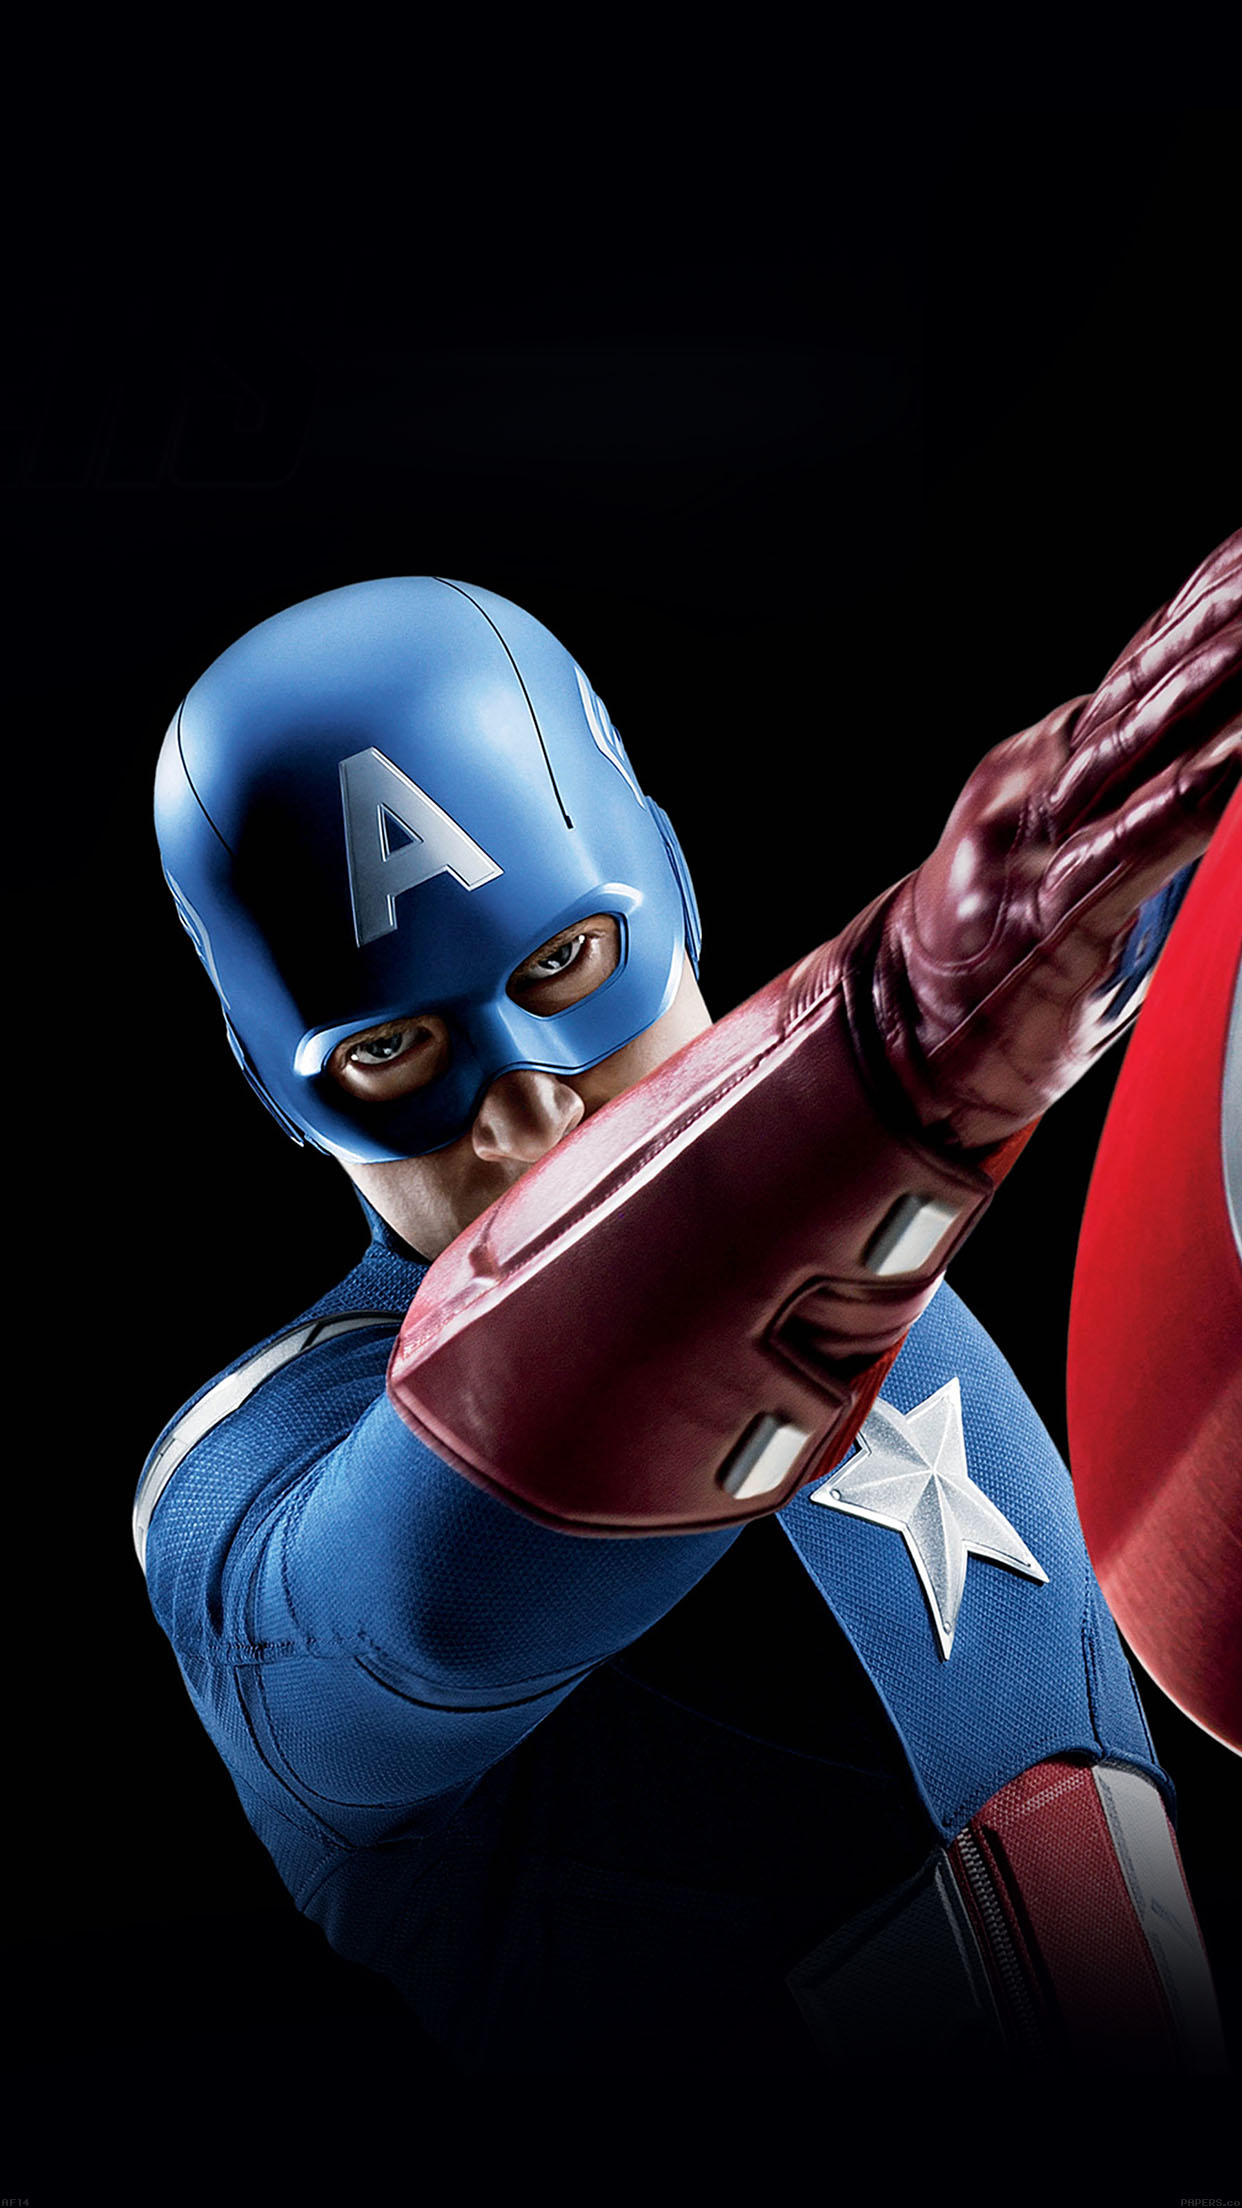 Wallpaper Iphone 6 Iron Man Af14 Avengers Captain America Illust Art Portrait Papers Co